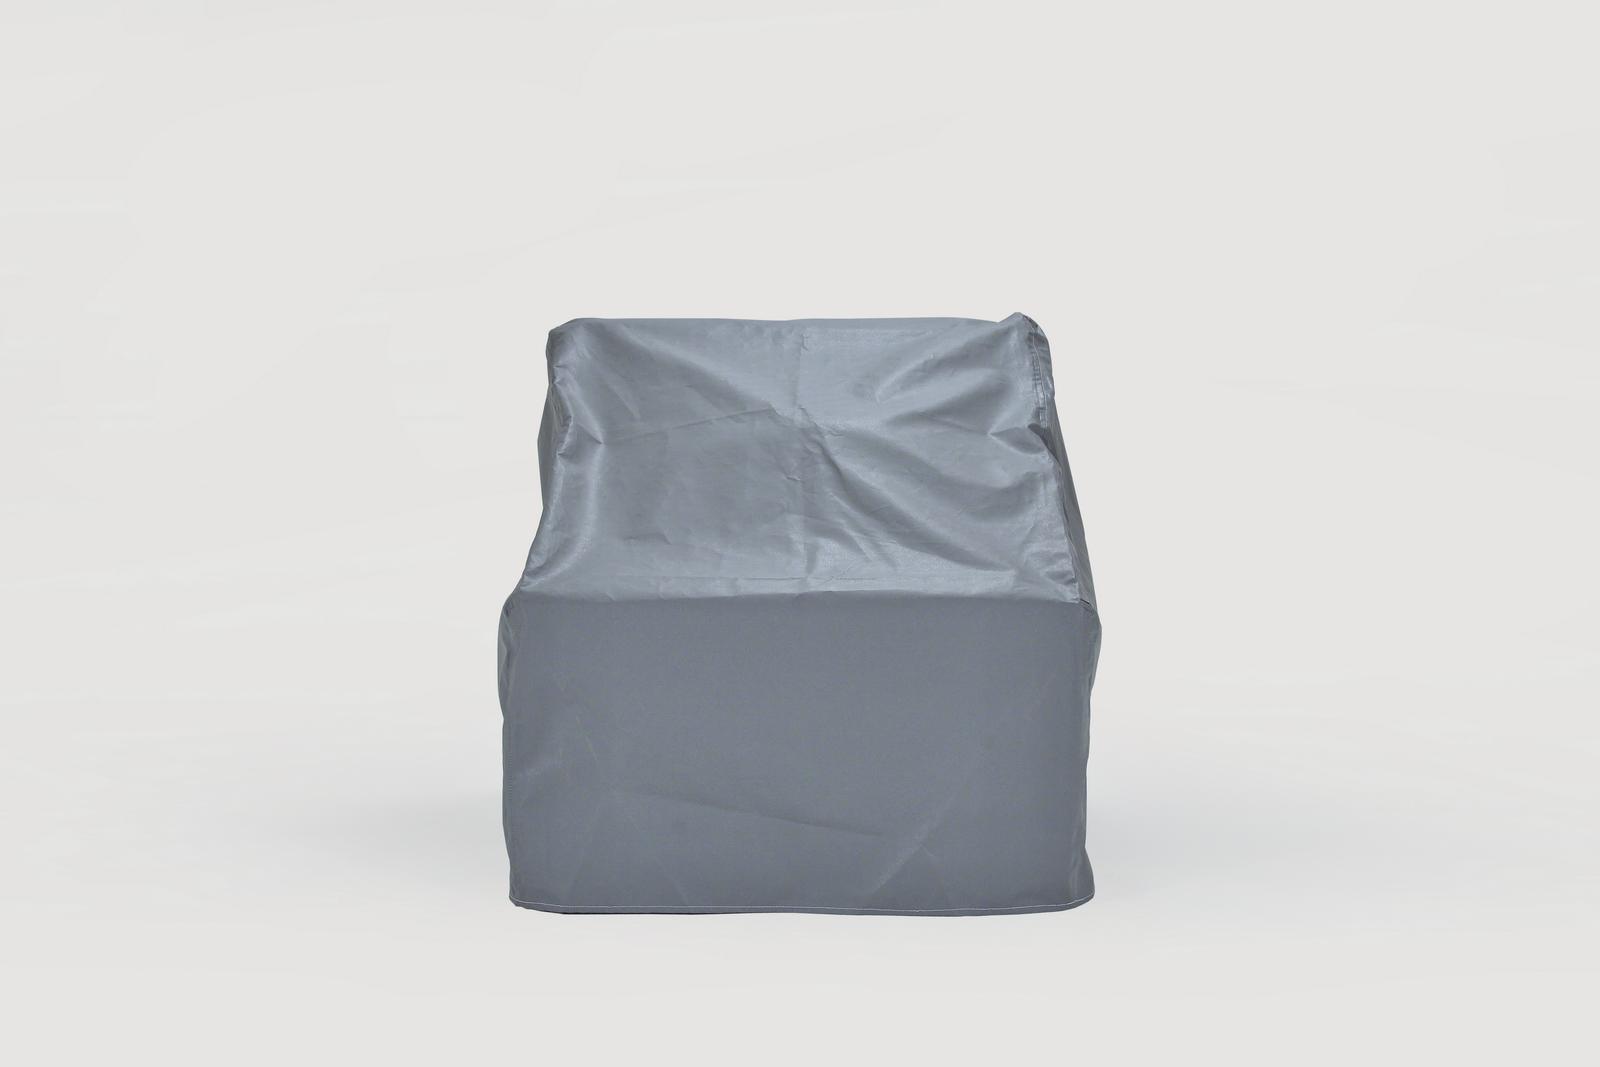 PTendercool-Ourdoor-Sofa-PT73(x8)-BS1-TE-DO-Palm Plain (Henna)-191101-08